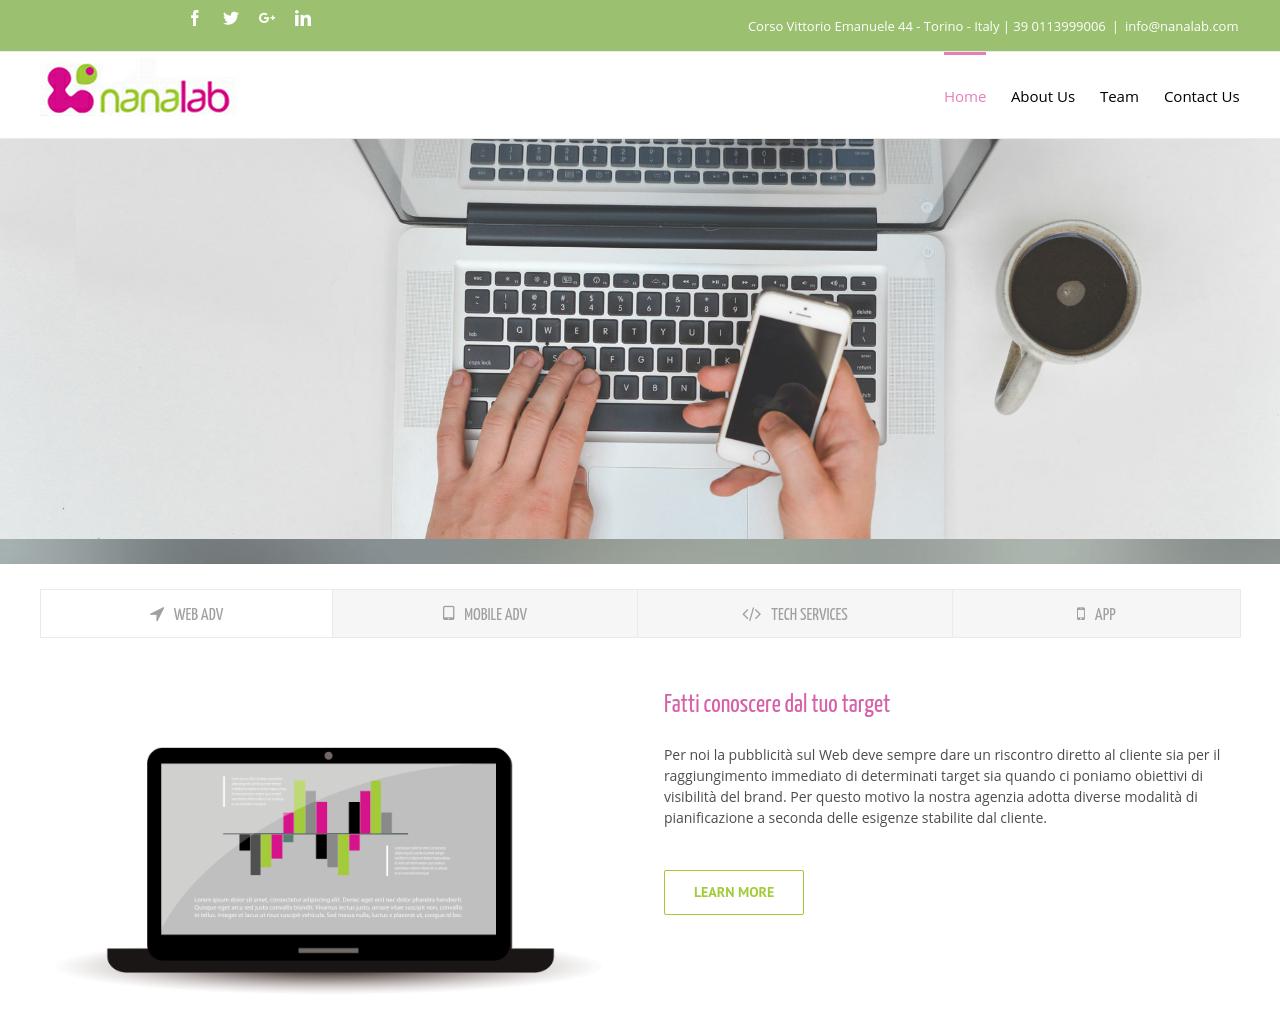 nanalab-Advertising-Reviews-Pricing